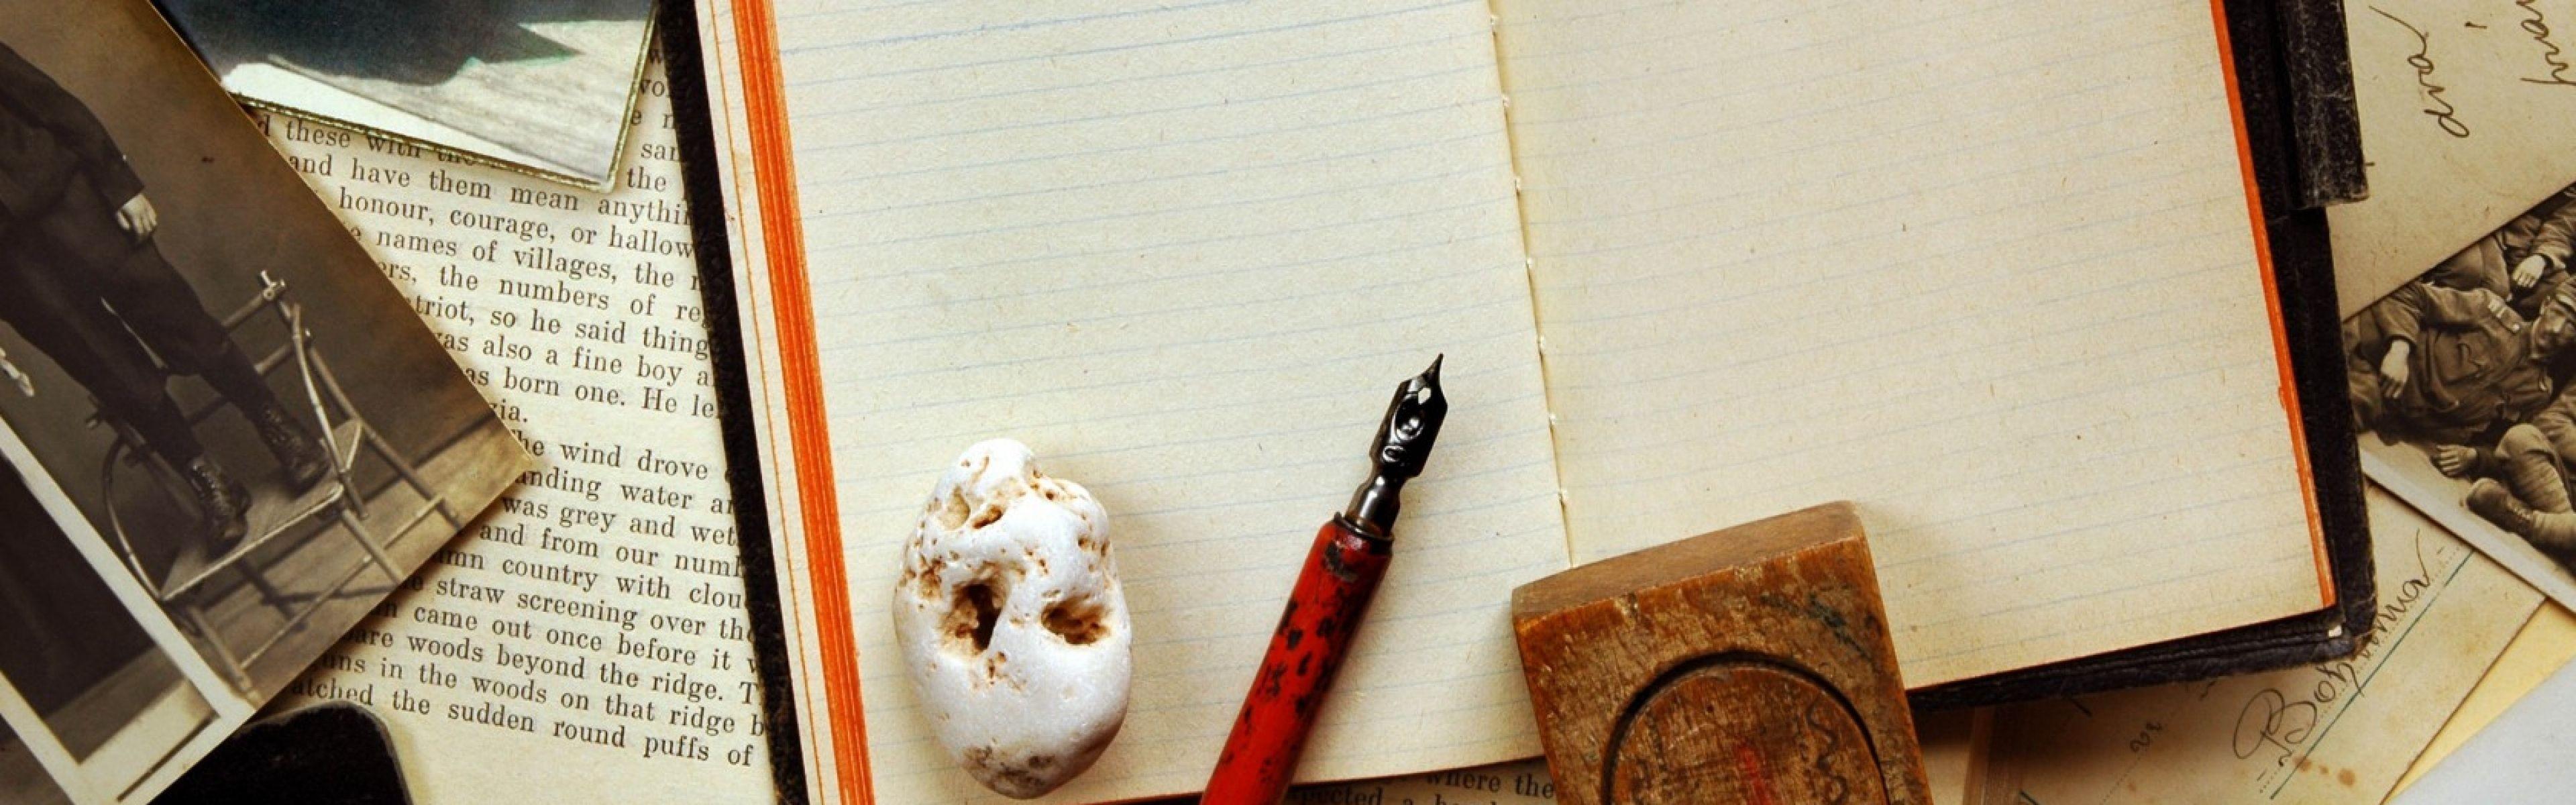 Download Wallpaper Vintage, Notebook, Pen, Photography .